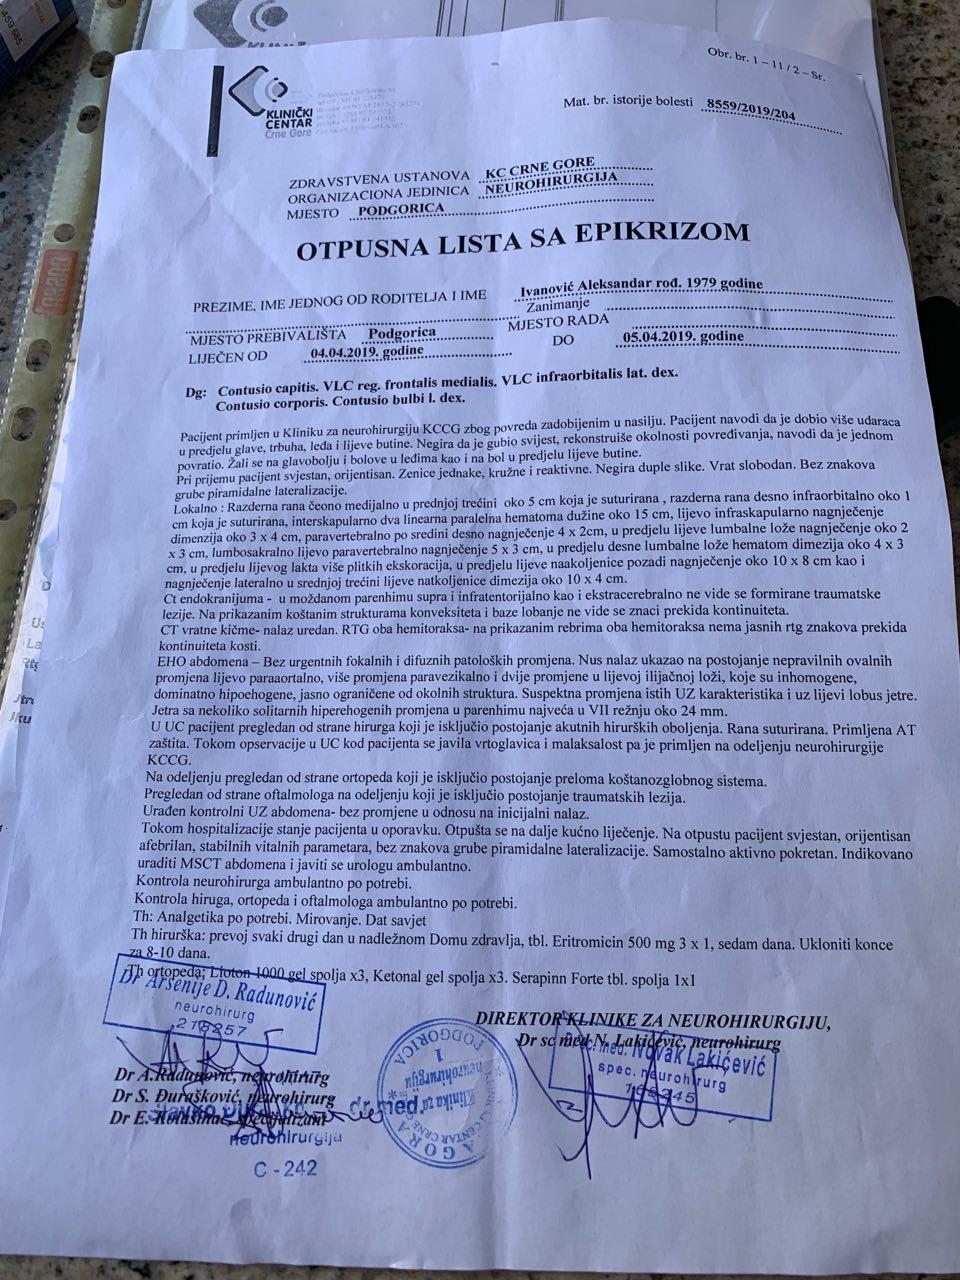 Caka-Ivanovic-otpusna-lista-001